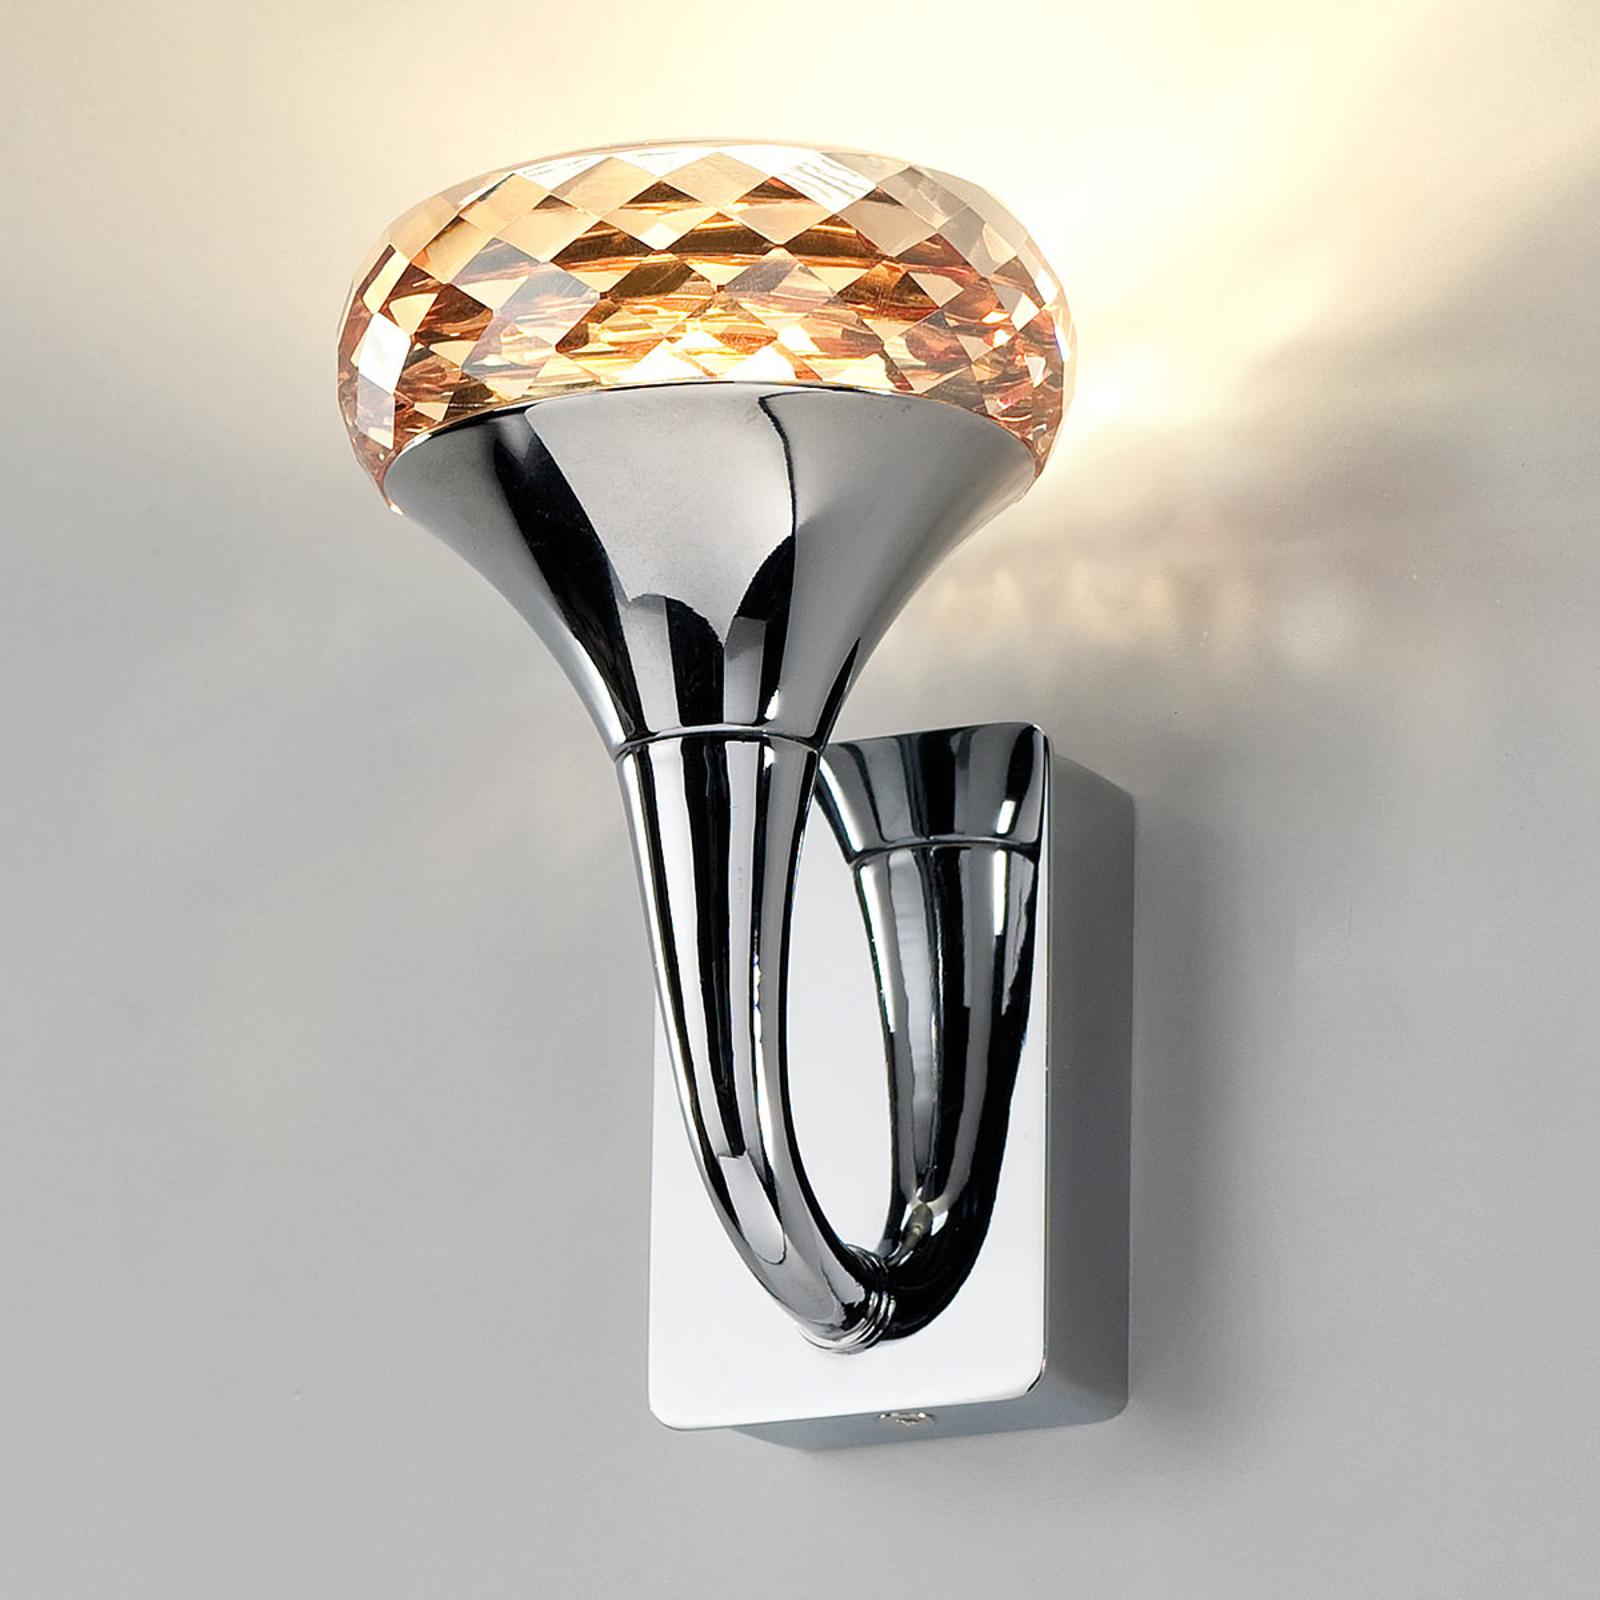 Applique LED de designer cristalline Fairy ambre